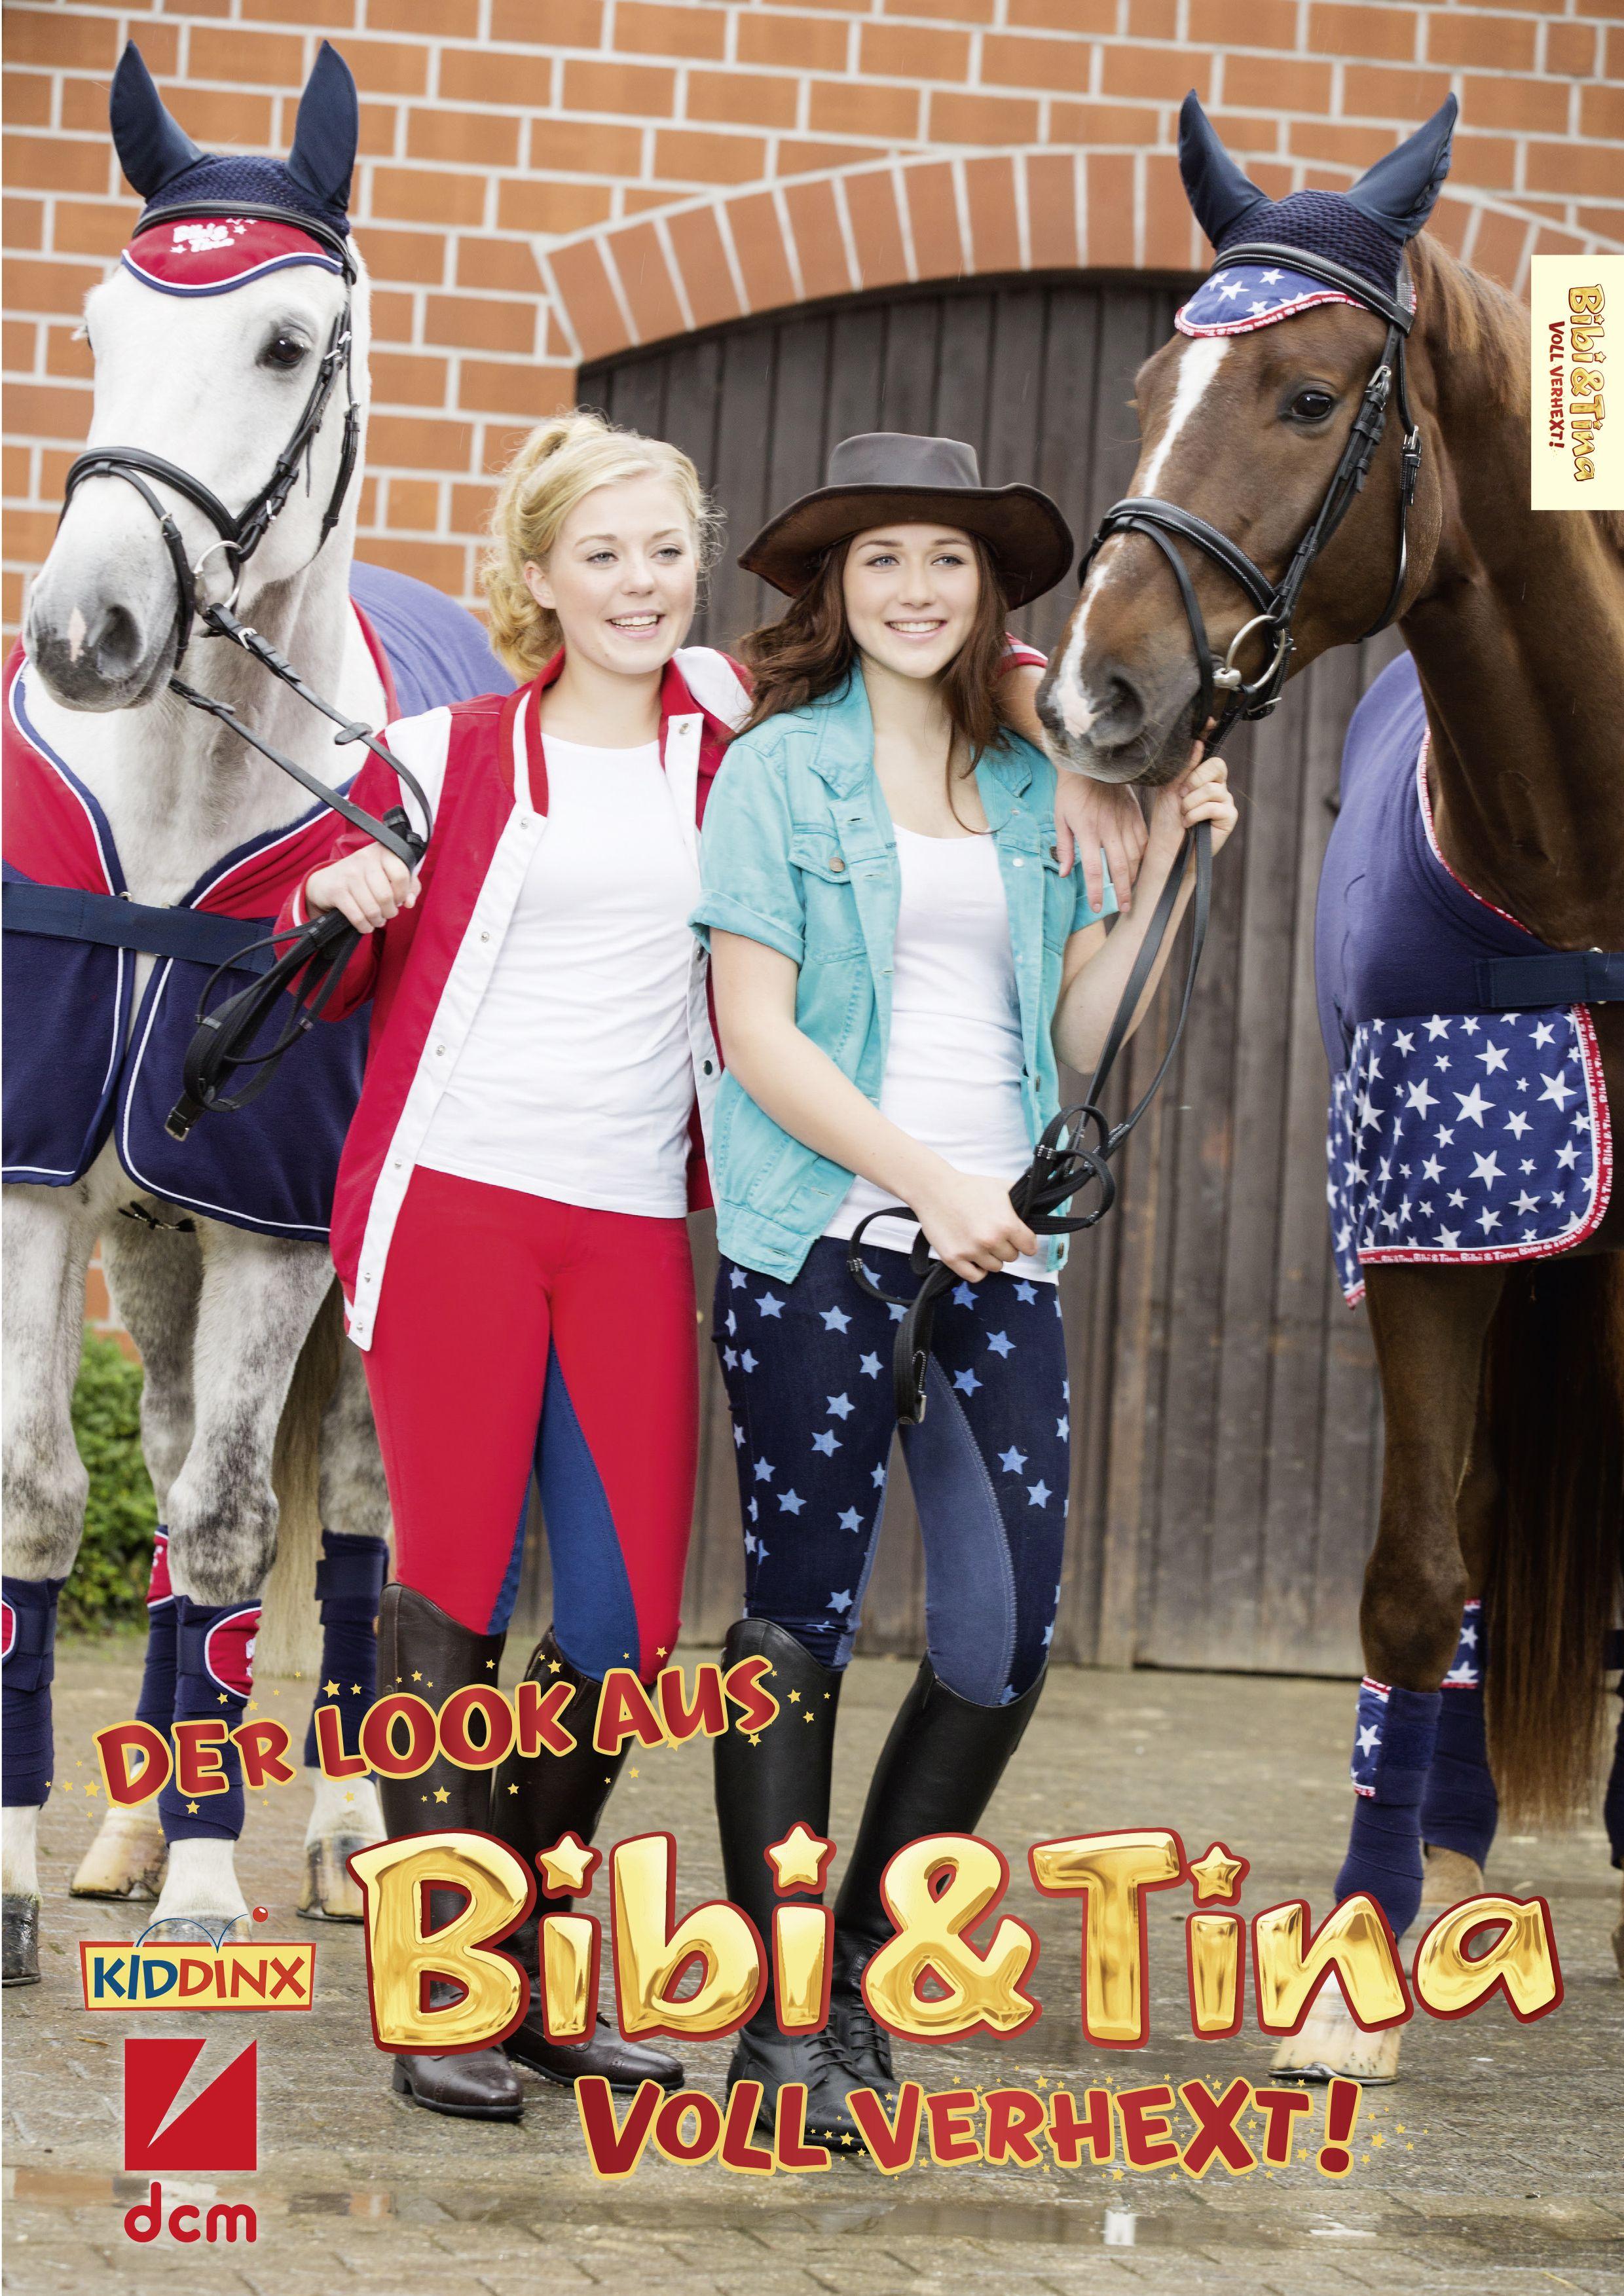 Die neue Bibi&Tina Kollektion 2015/2016 ist in Ihrem Reitsportfachgeschäft oder auf www.hkm-sports.eu erhältlich  #hkm #reitmode #kinderreithosen #kinderreitbekleidung #equestriankids #equestrian #equestrians #horsebackriding #horses #kids #bibi #tina #bibi&tina #bibiundtina #reitsport #saddlepad #hkmsportsequipment #reitsportmode #reiter #reithelm #hkmbasics #collectiondynamic #fallwinter #herbstwinter #hkmkatalog #breeches #ridingfashion #hkmflyer